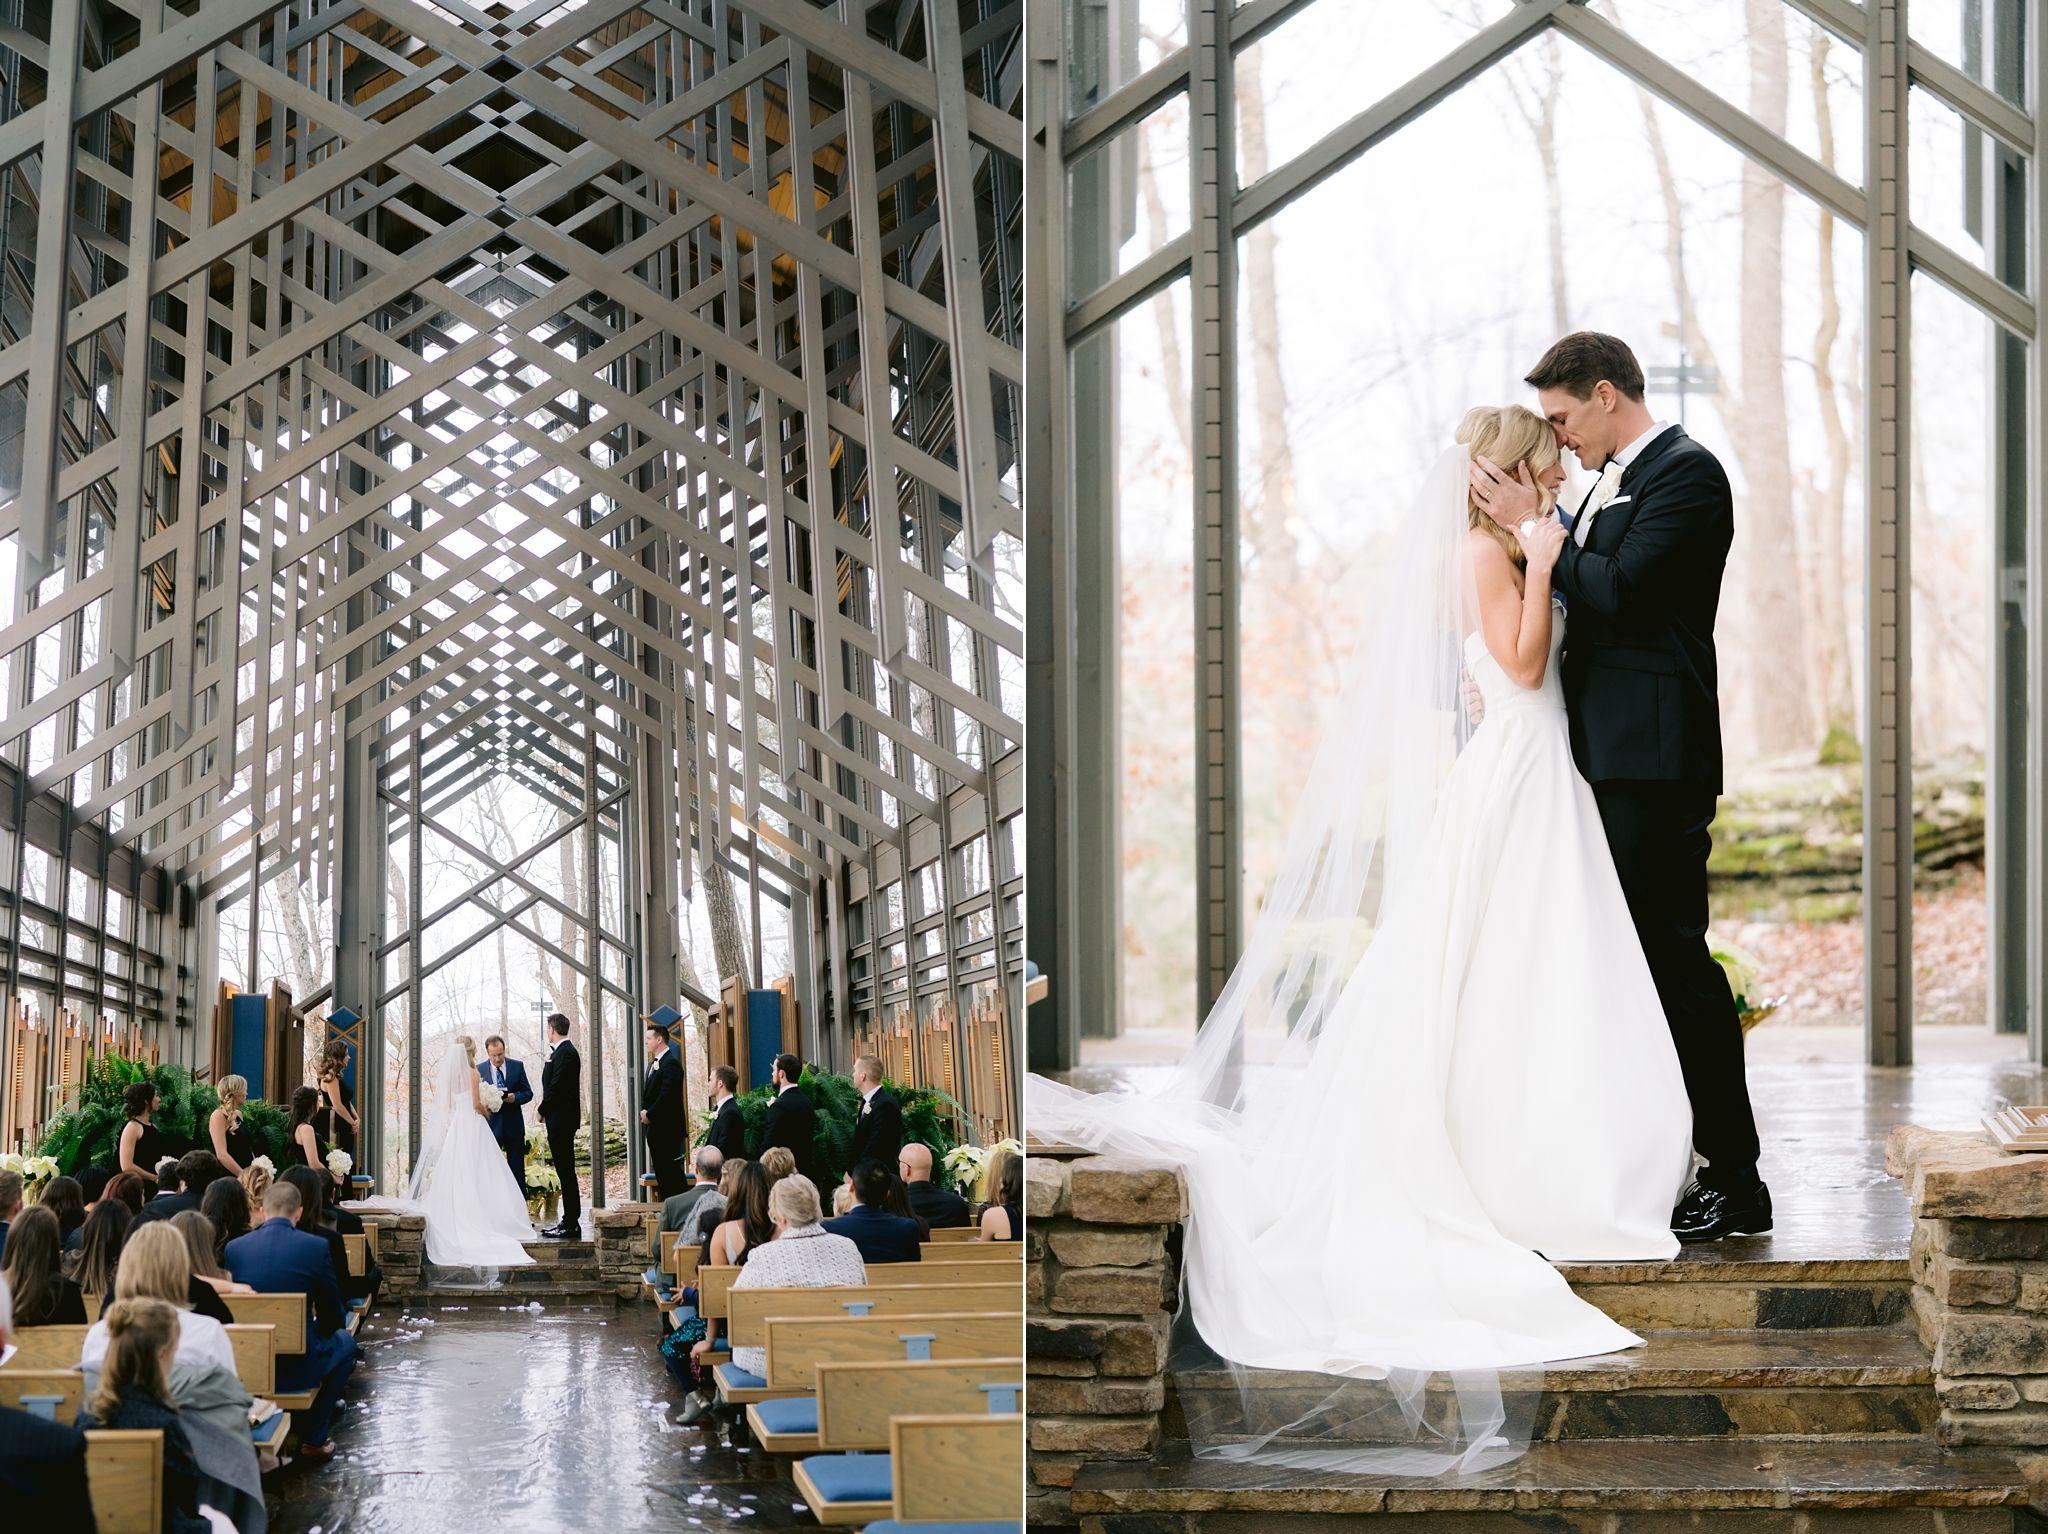 Steph Smith Weddings Destination Wedding Ideas Glass Chapel